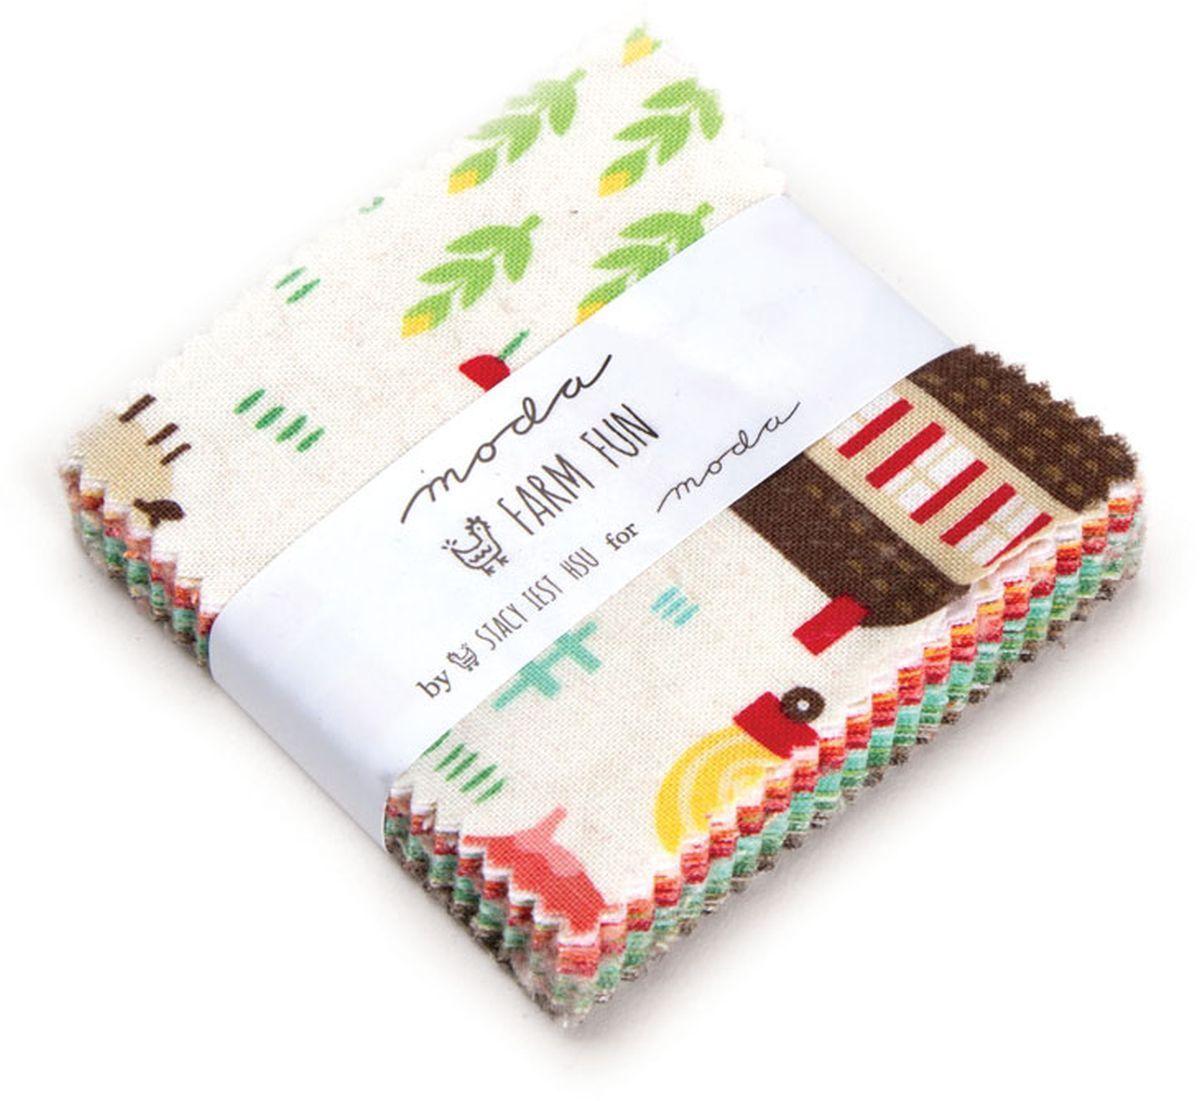 "Farm FunModaMini Charm Pack By Stacy Iset Hsu; 42 - 2.5"" Precut Fabric Quilt Squares"